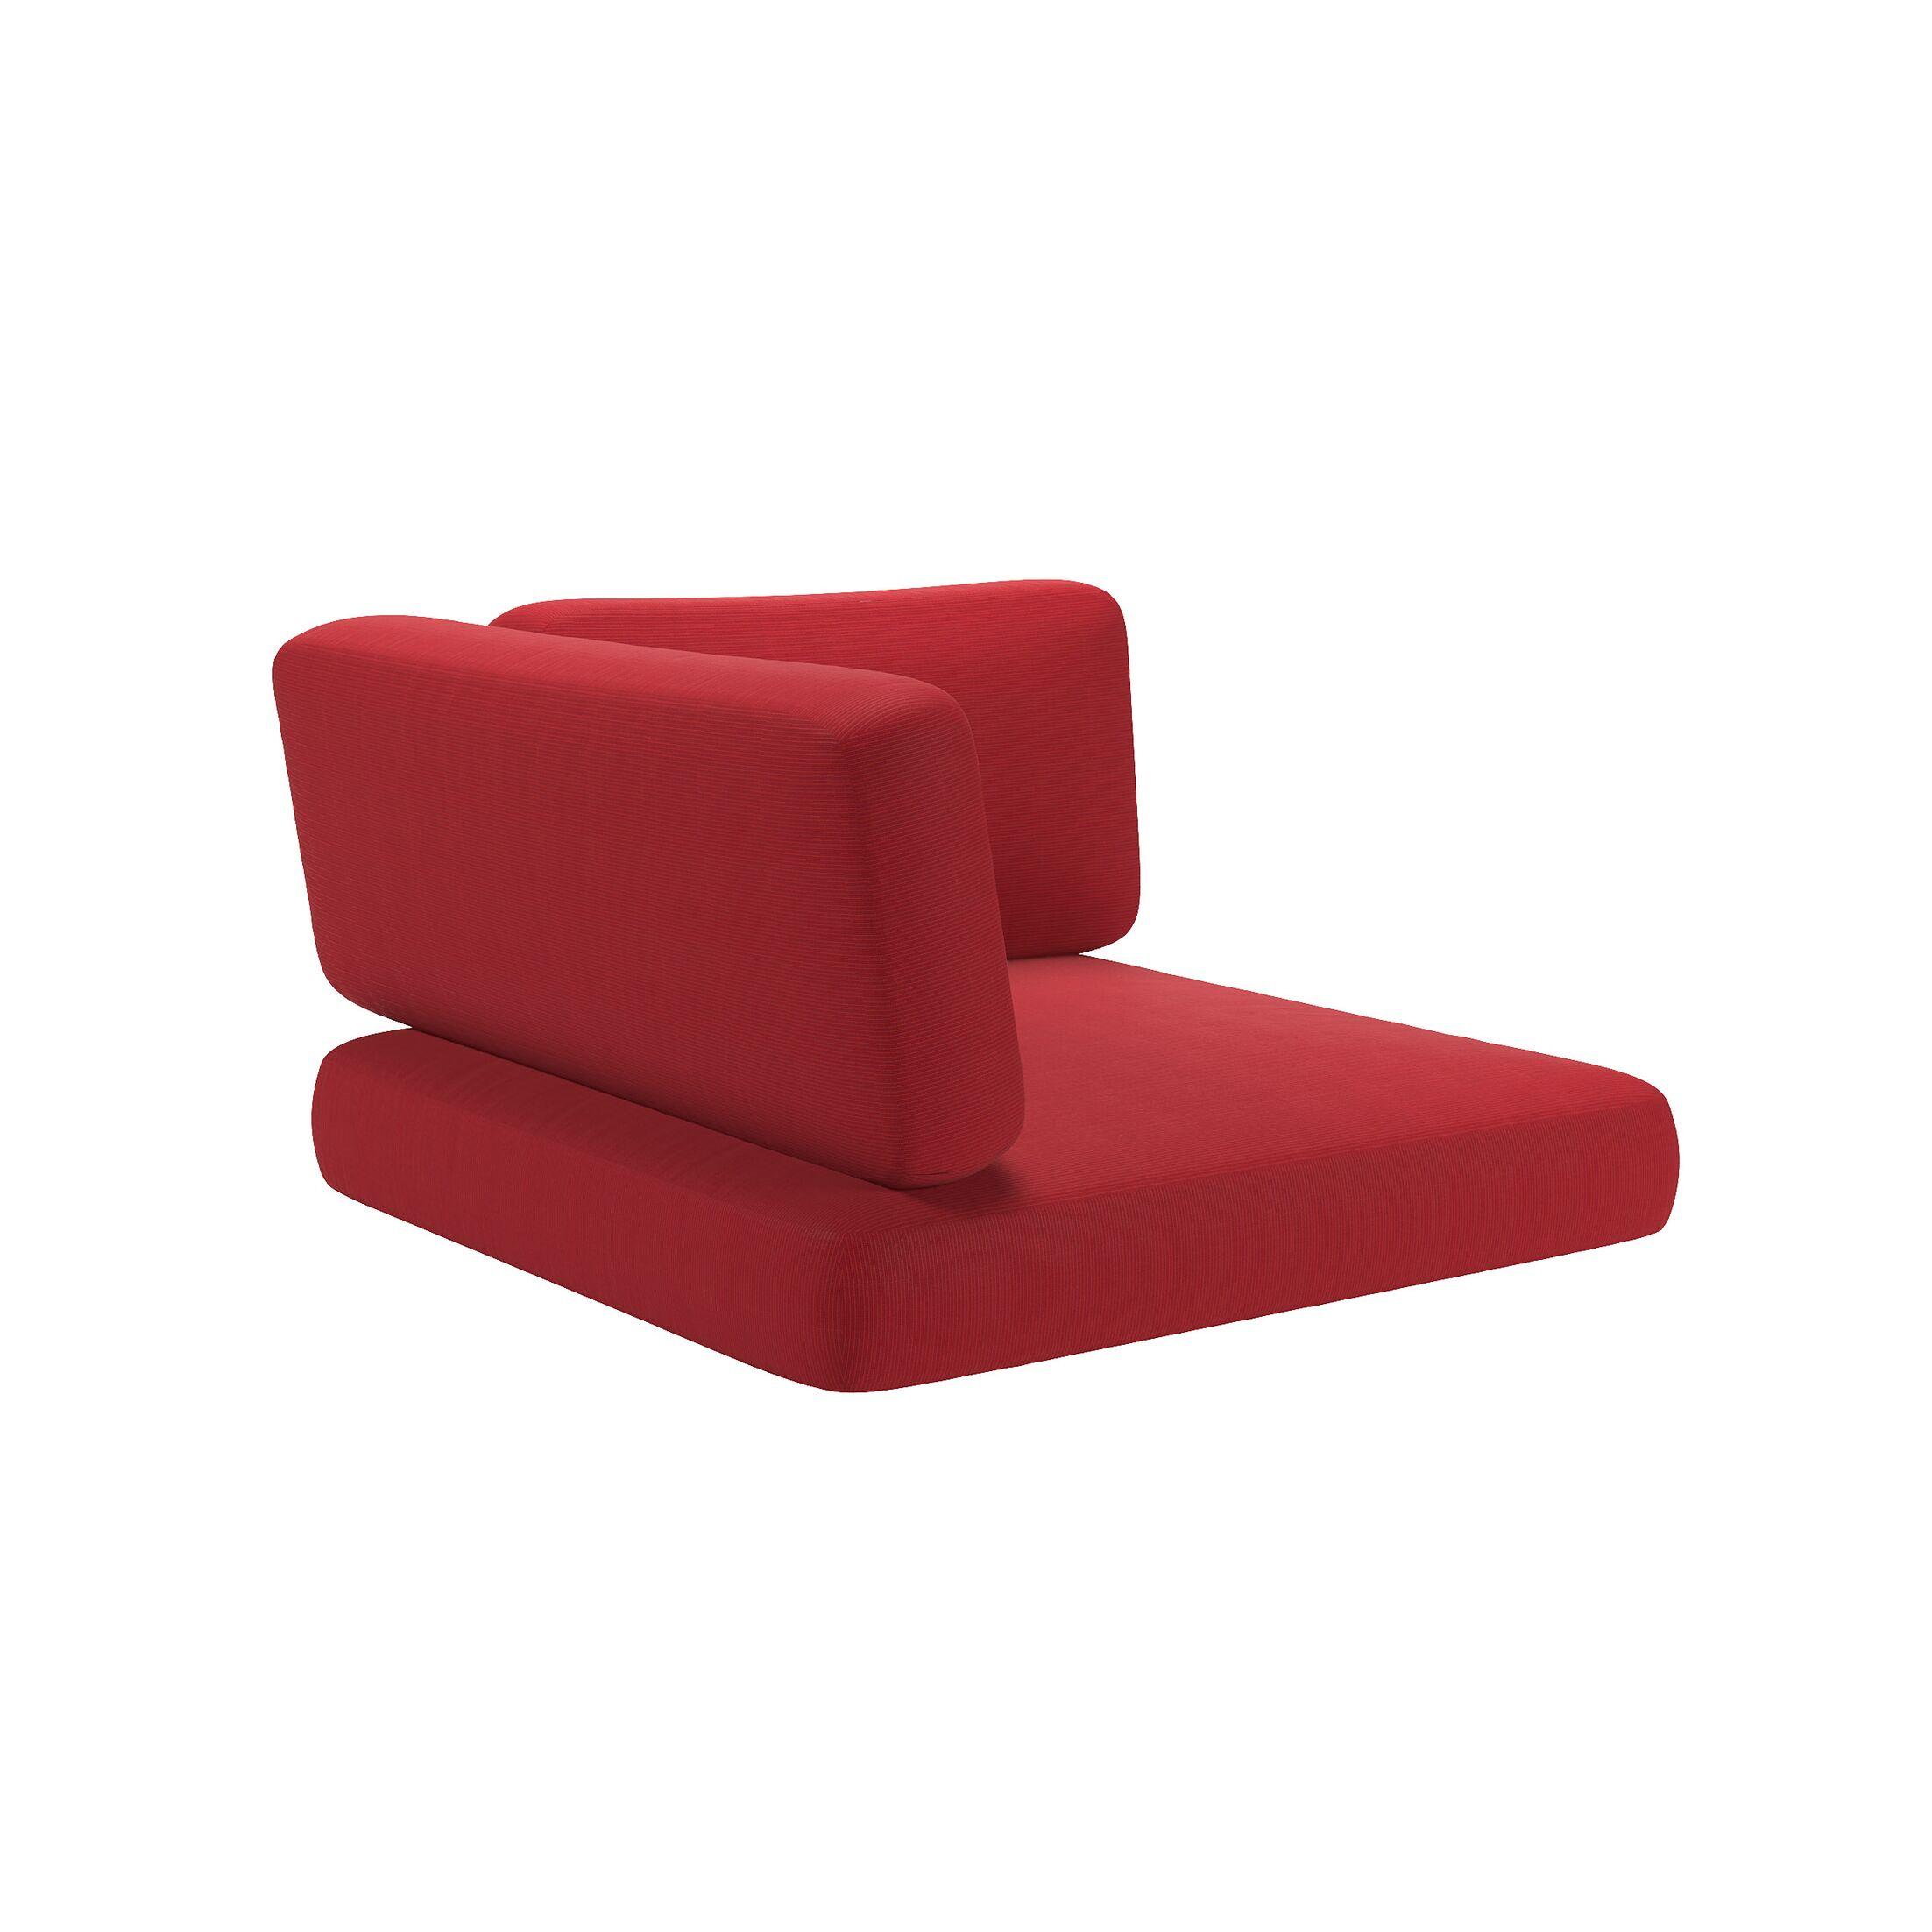 3 Piece Indoor/Outdoor Corner Chair Cushion Set Fabric: Red